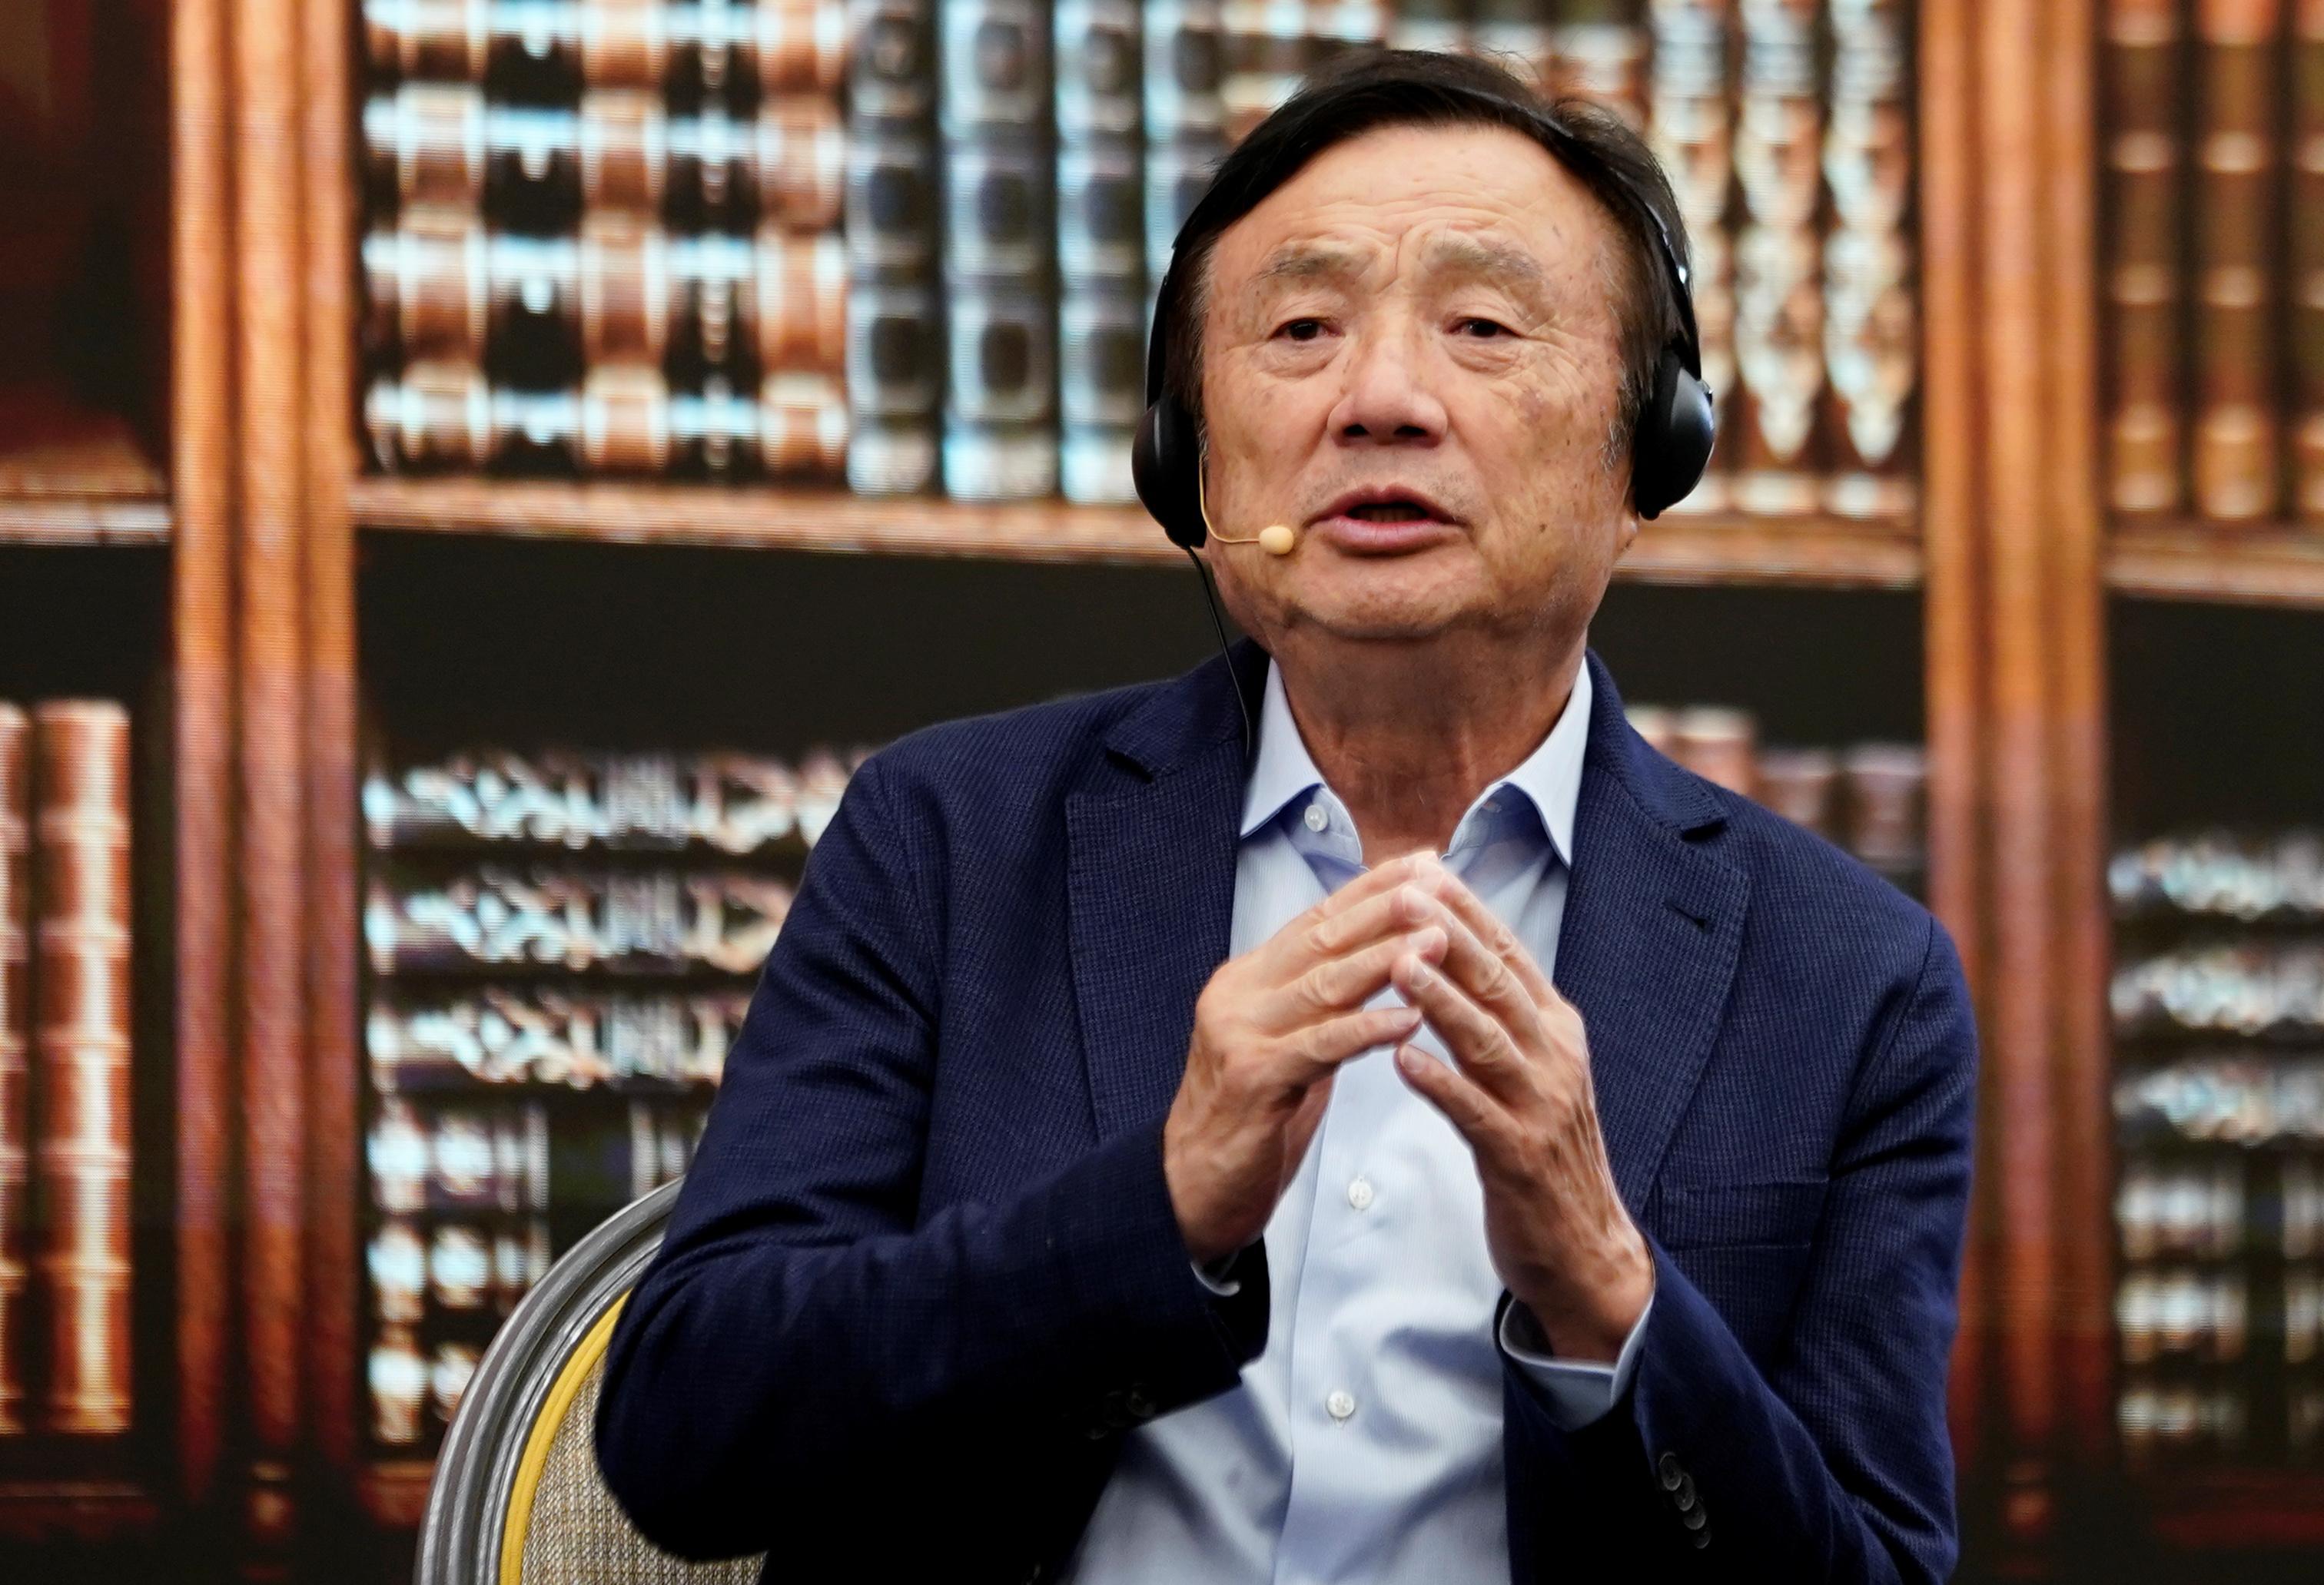 Huawei founder details 'battle mode' reform plan to beat U.S. crisis